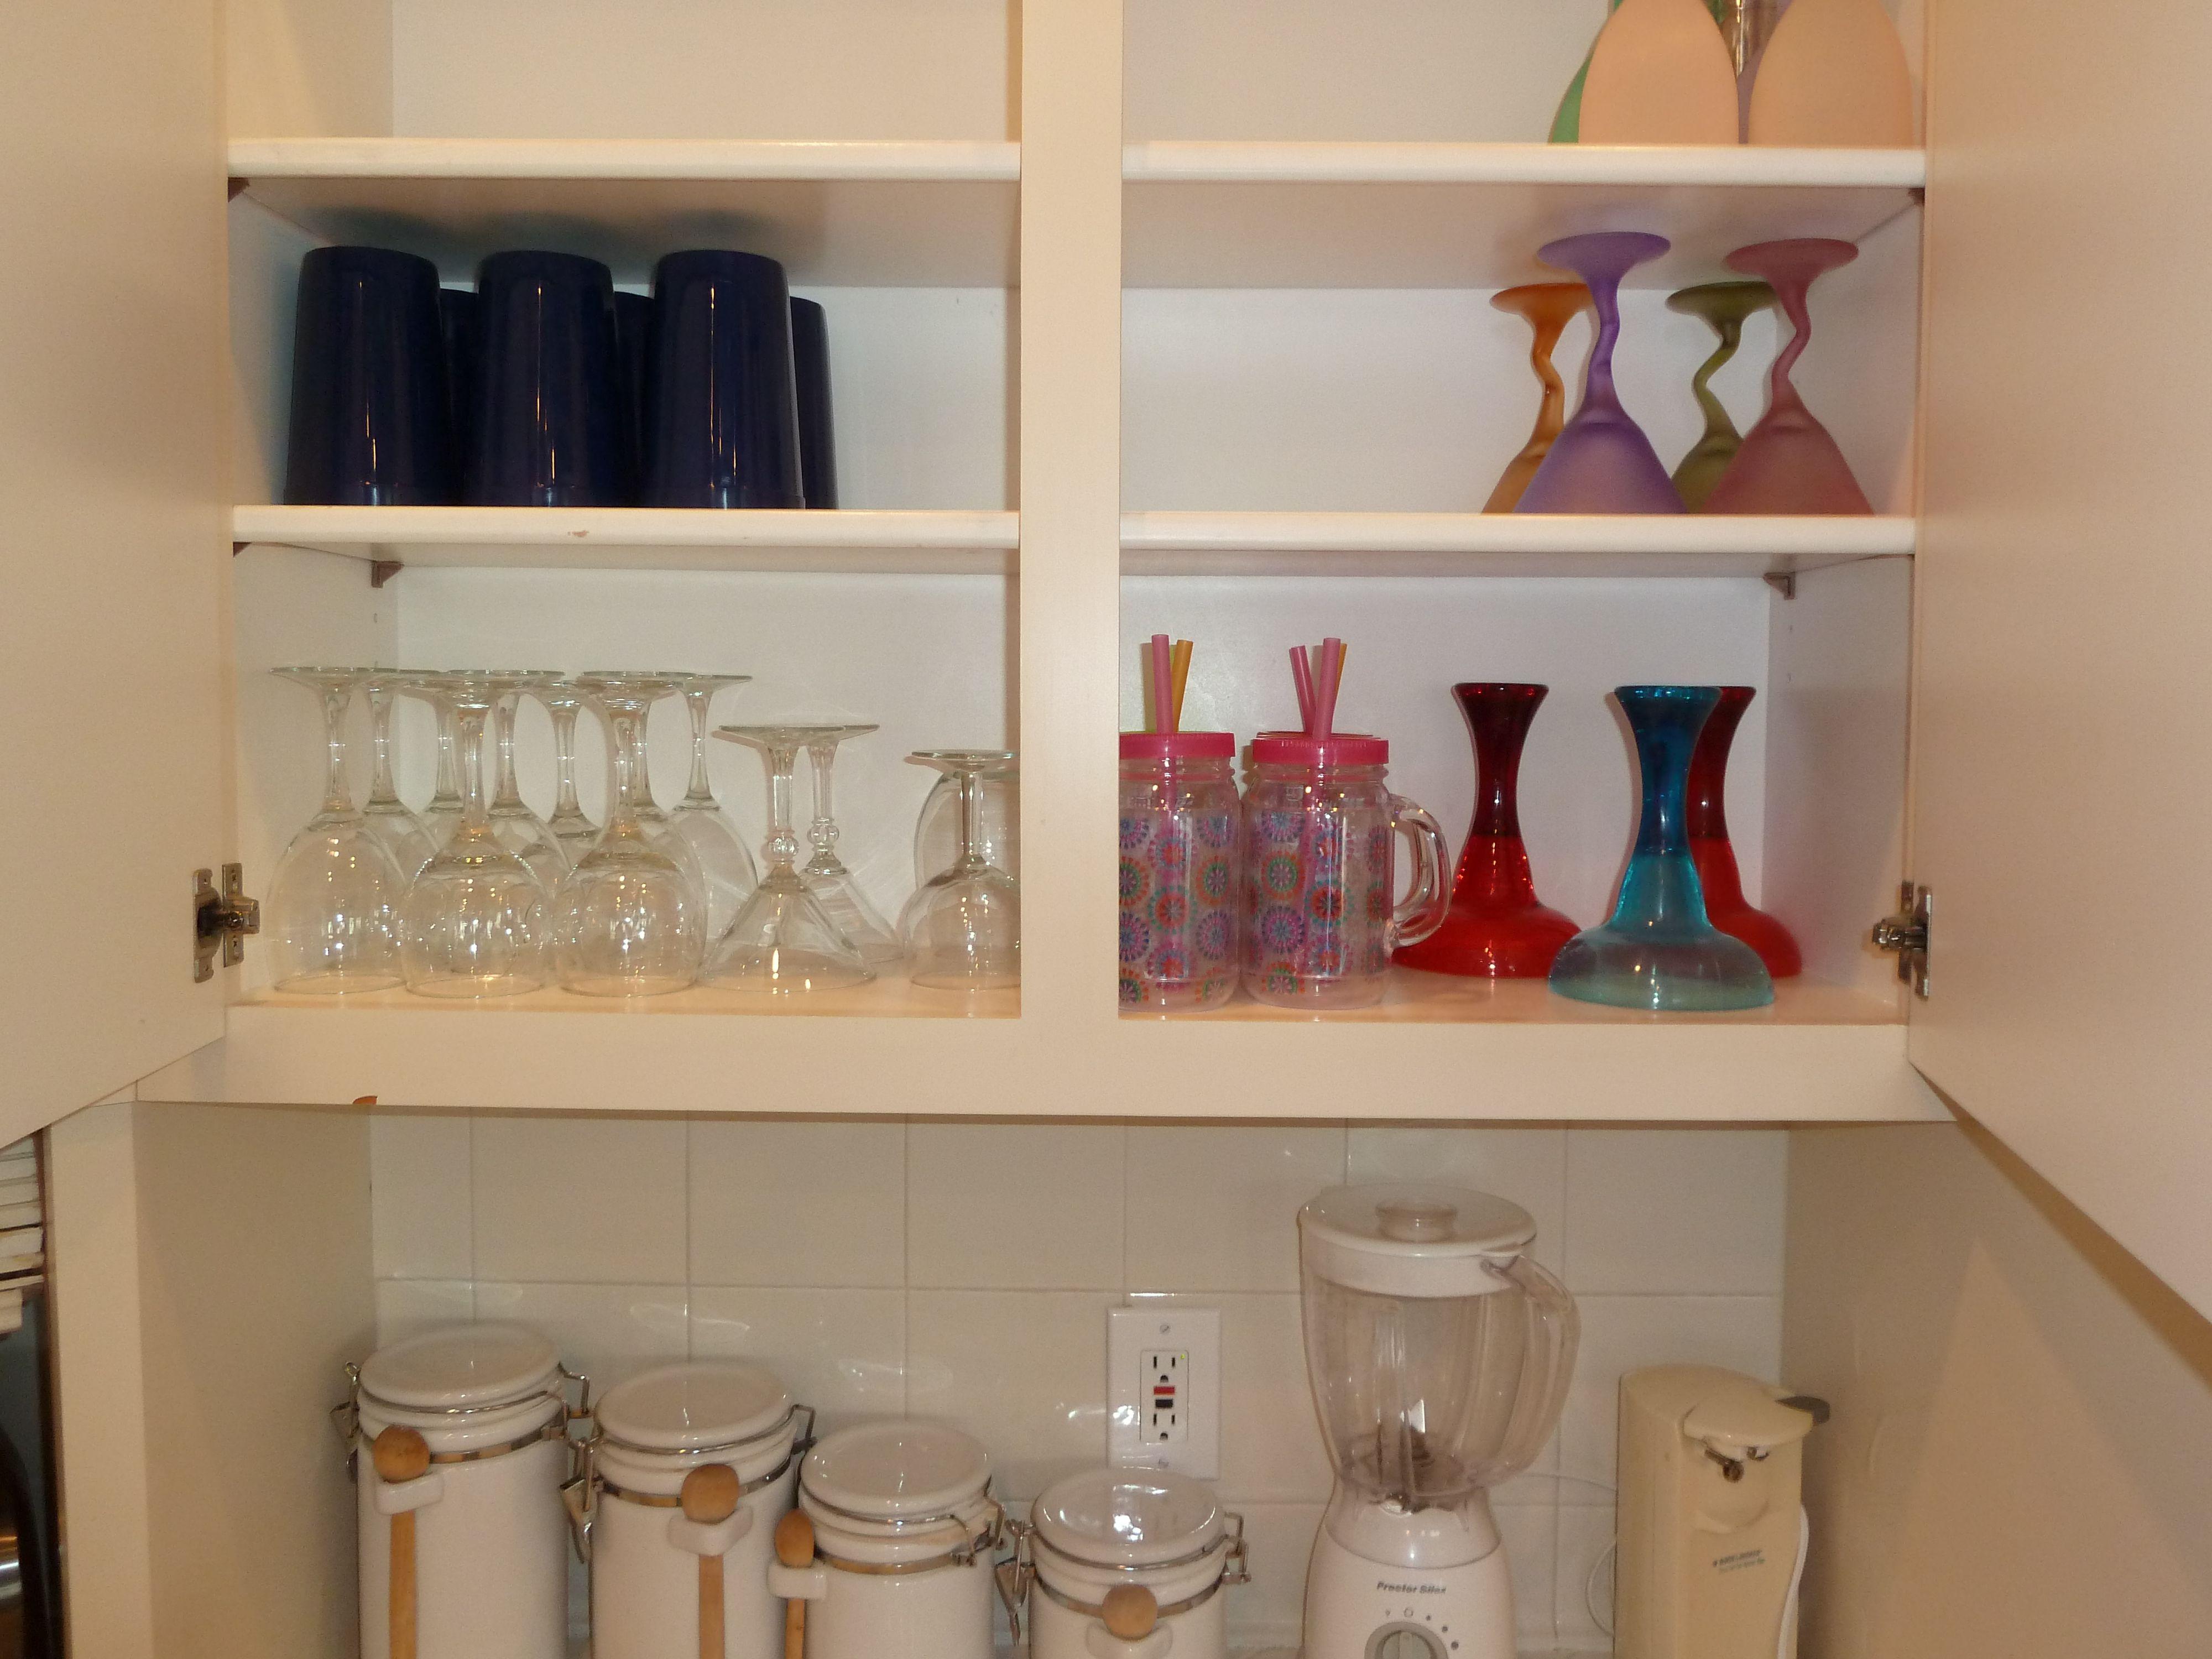 Upper Cabinet Left of Refrigerator Glasses Wine Glasses